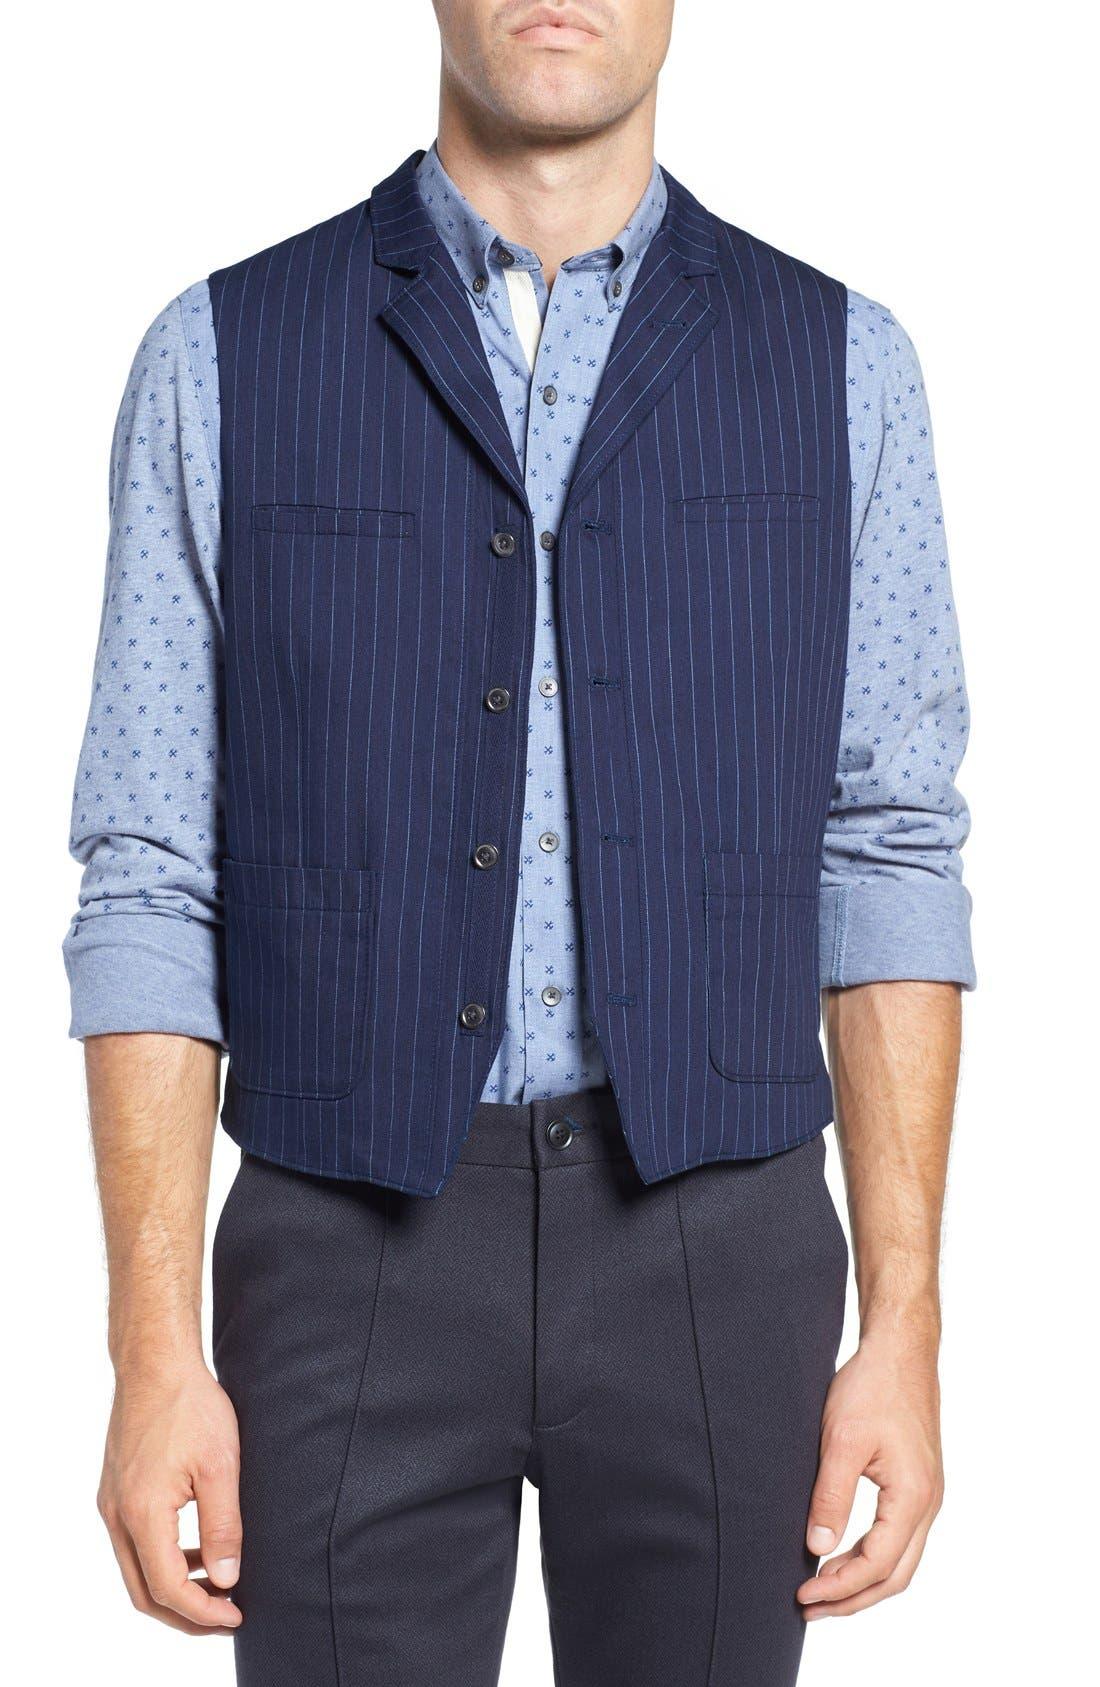 W.R.K Windsor Pinstripe Cotton Twill Vest